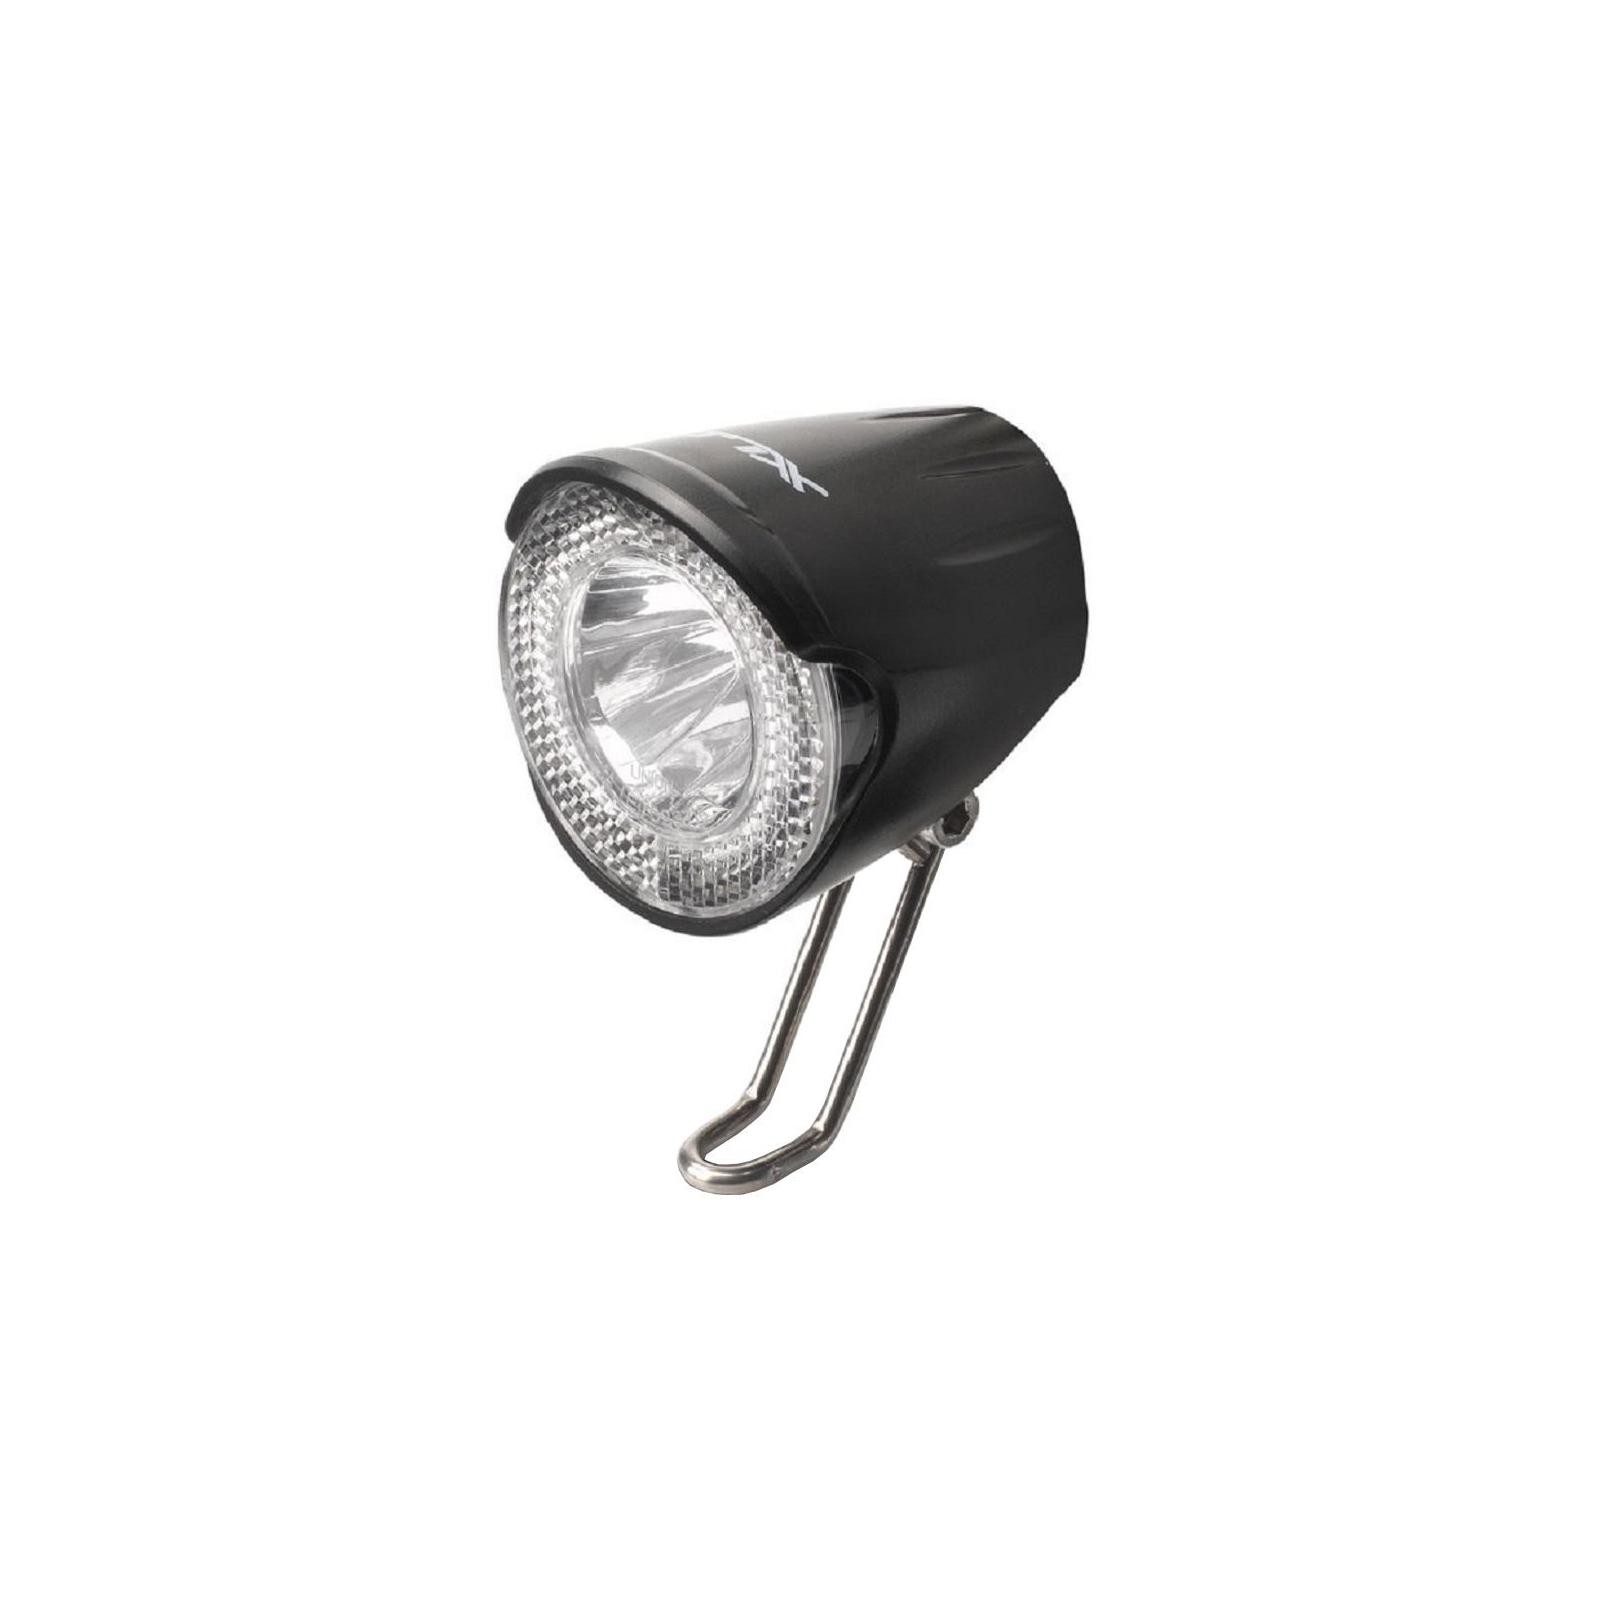 Передняя велофара XLC LED 20Lux, черный (2500220600)